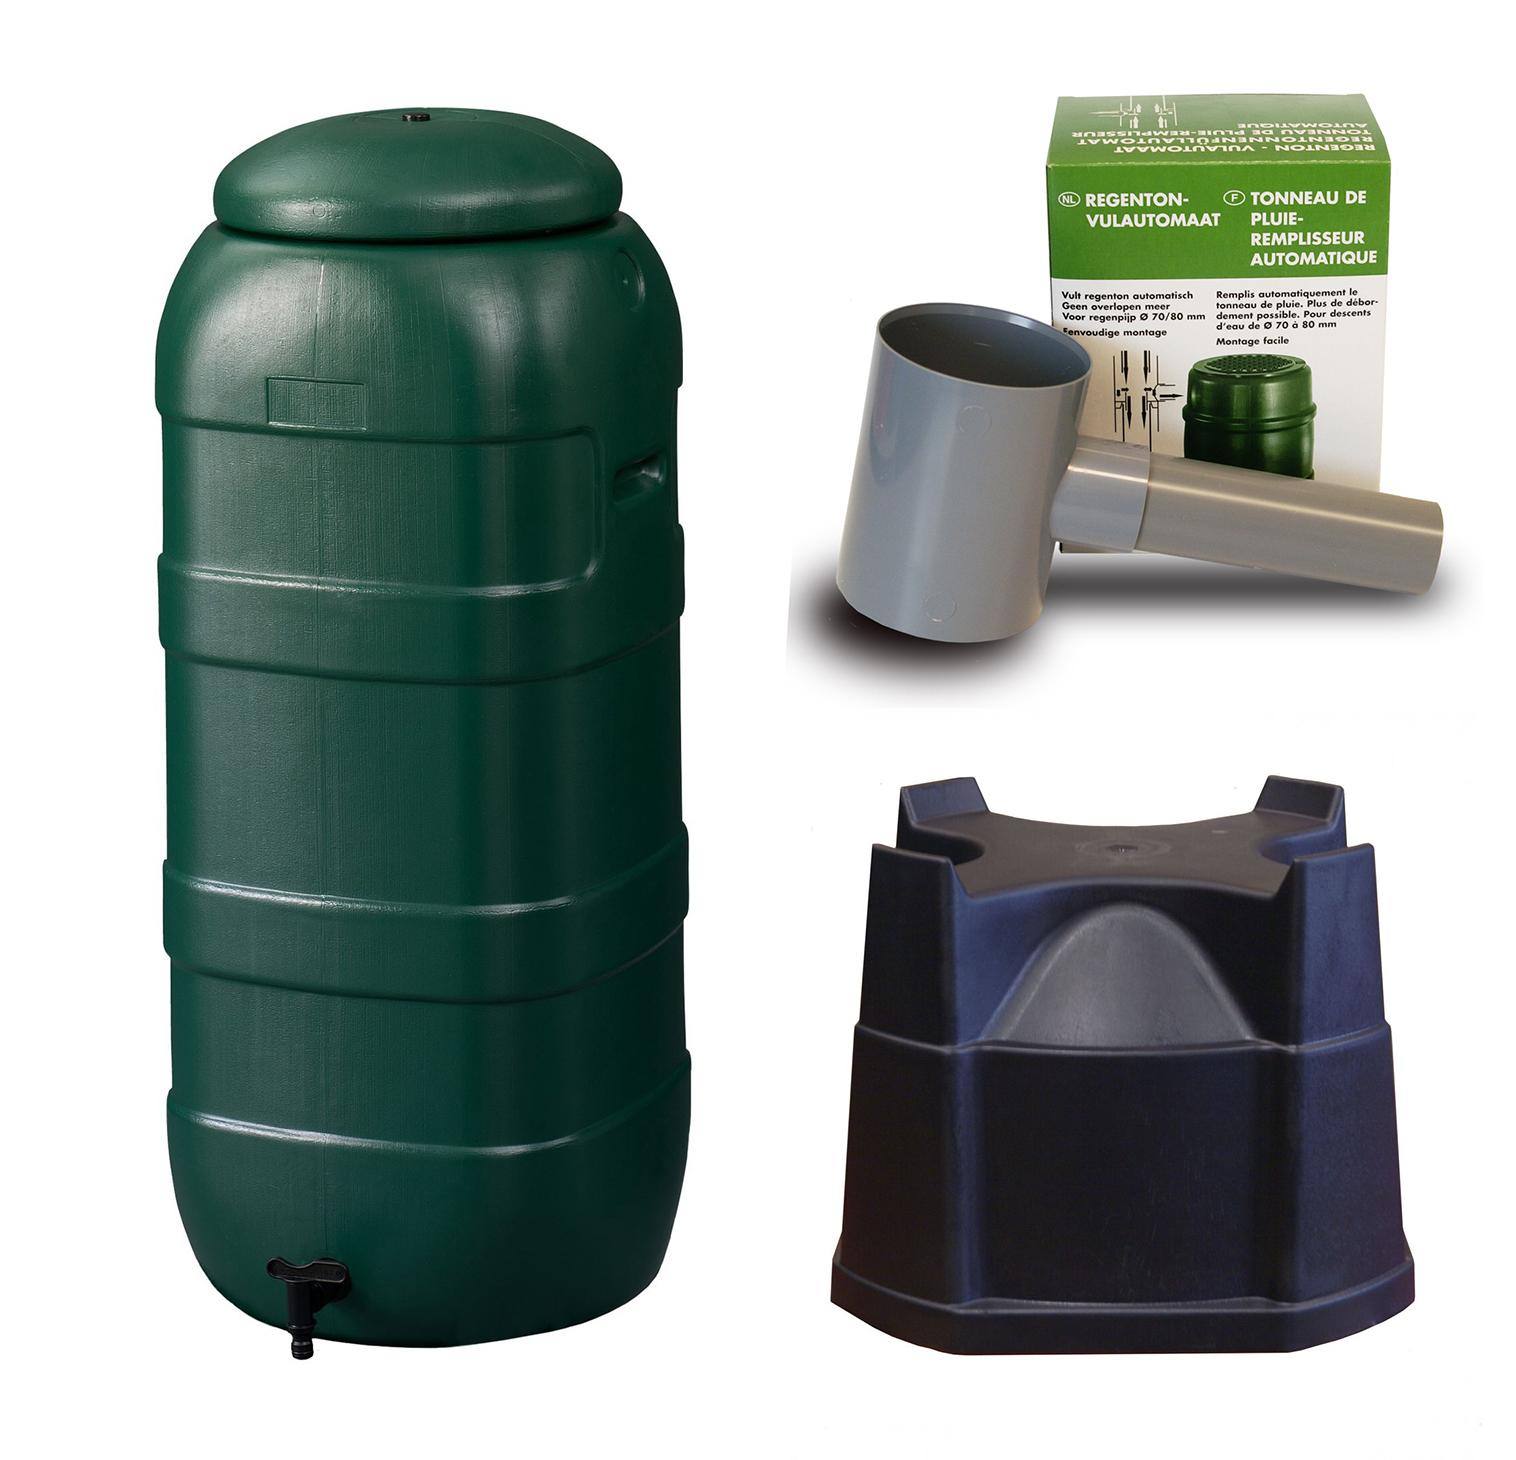 Harcostar Rainsaver Regenton 100 Liter Groen met Vulautomaat en hele Voet